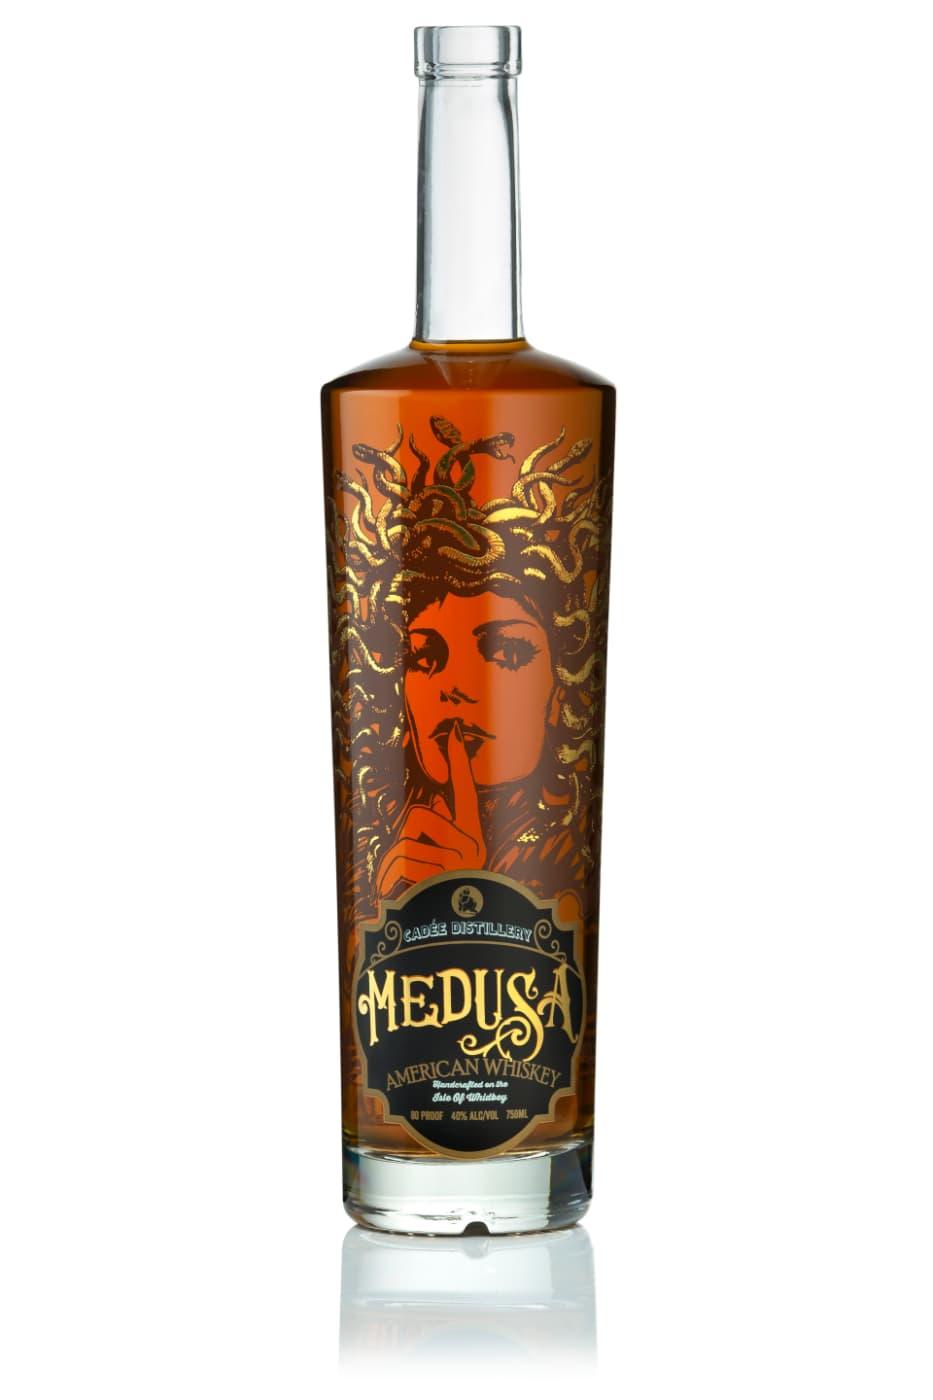 Cadee Medusa American Whiskey